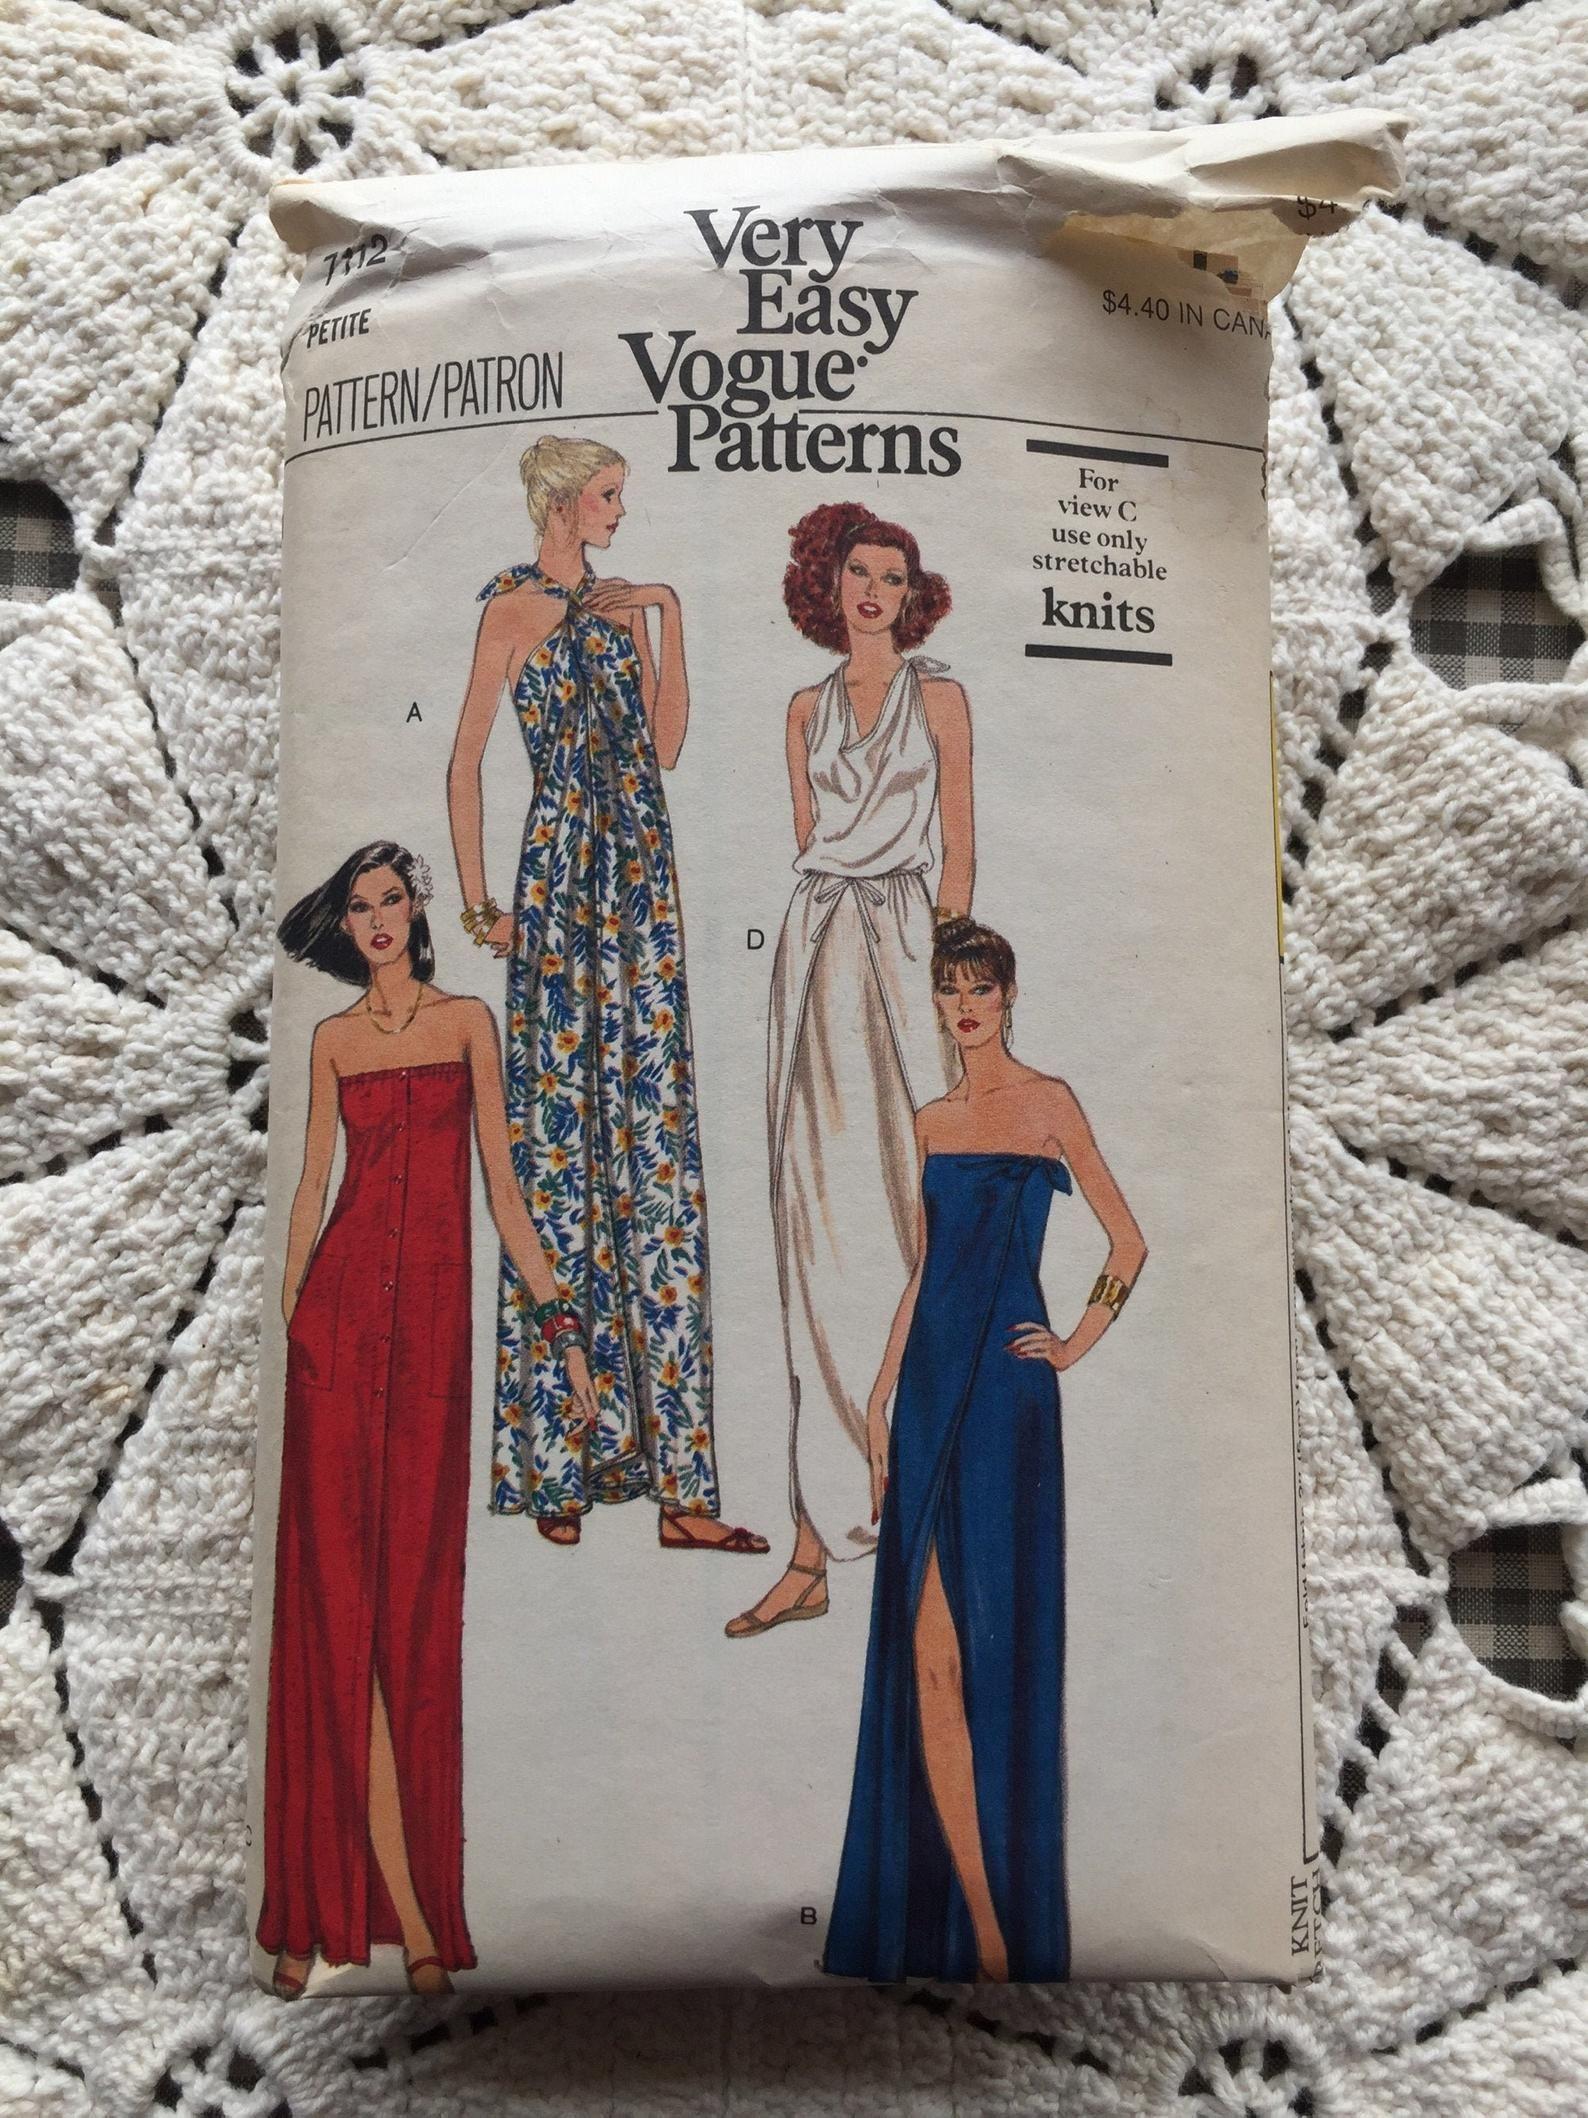 Vogue 7112 1970s Sewing Pattern Maxi Dress Halter Etsy Maxi Dress Pattern 1970s Sewing Patterns Vogue Patterns [ 2118 x 1588 Pixel ]